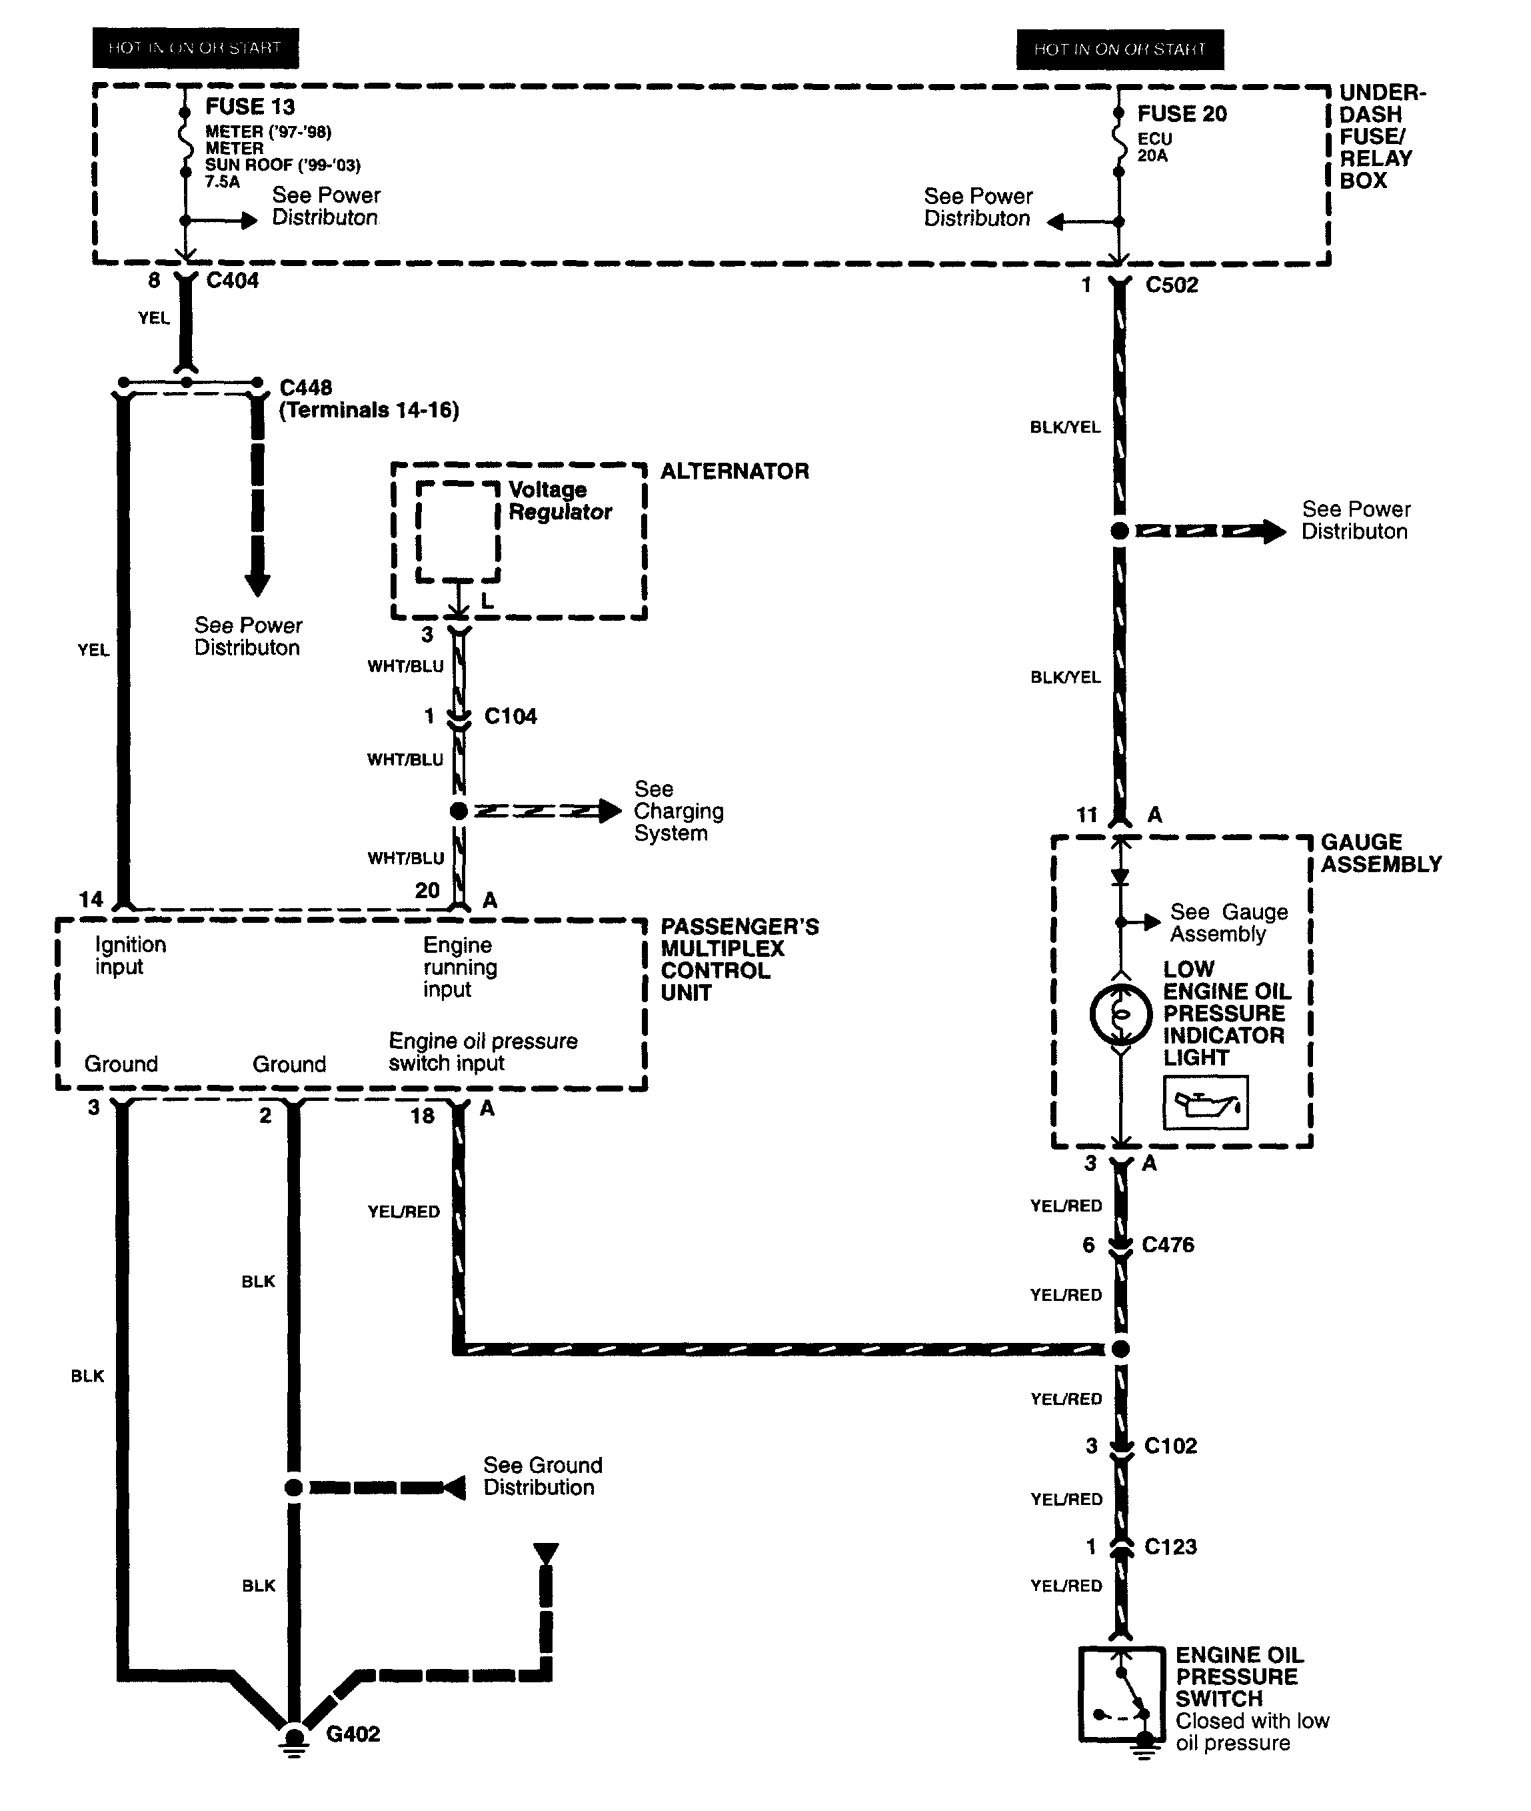 2001 Acura Rl Wiring Diagrams - Wiring Data